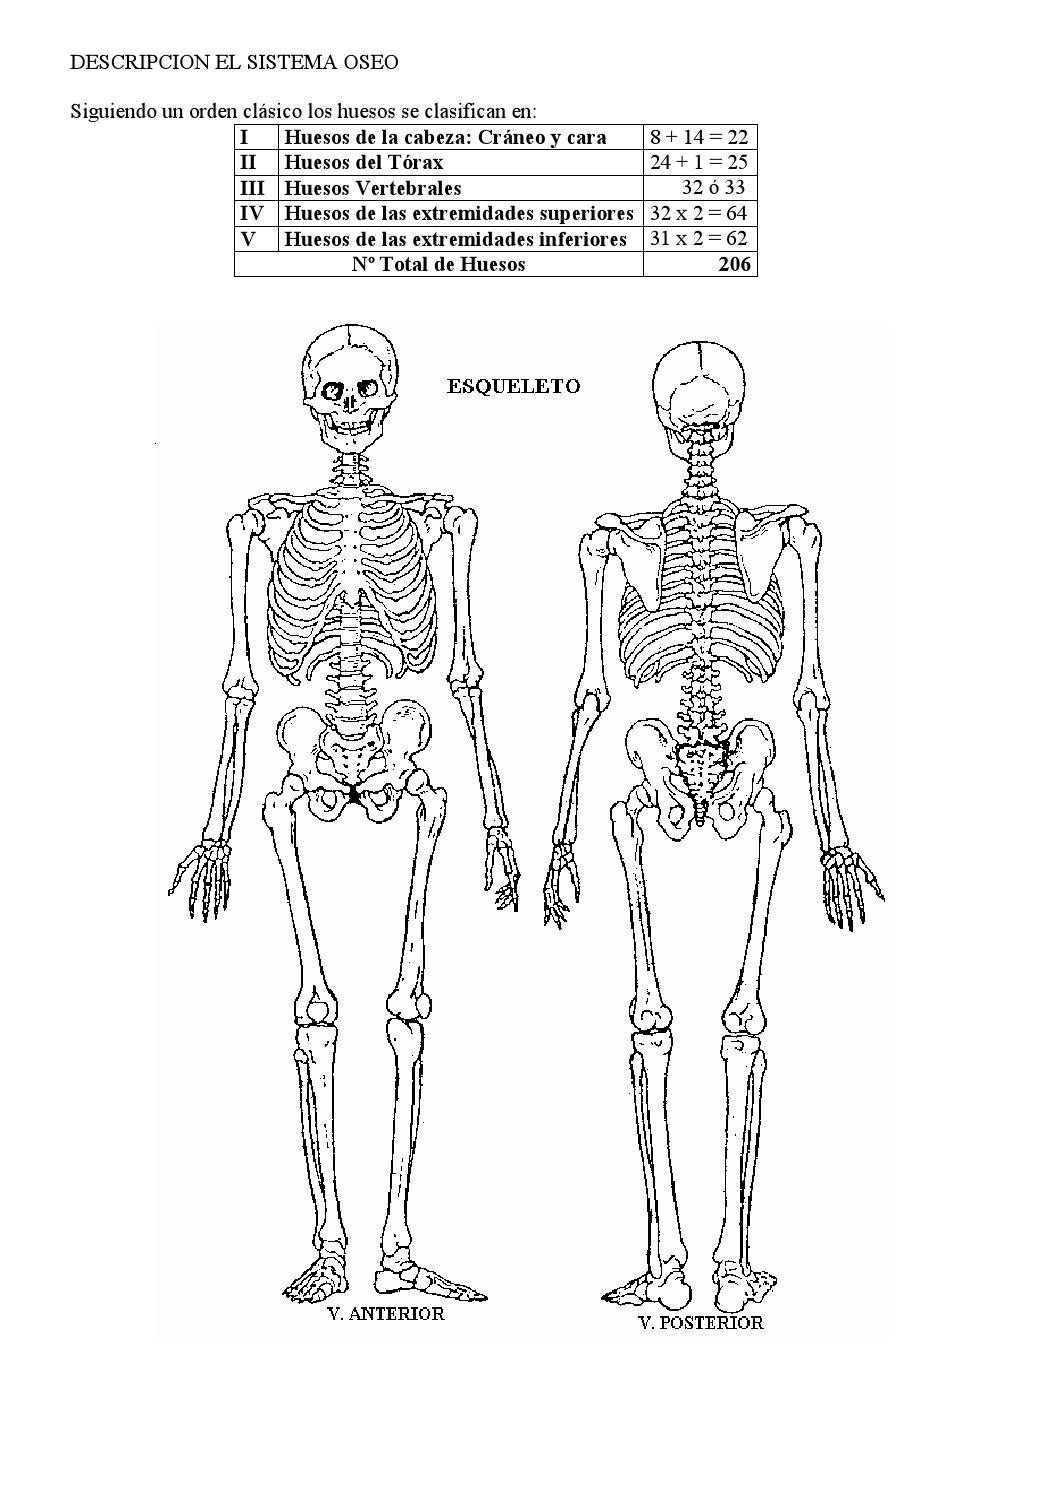 huesos de las extremidades superiores